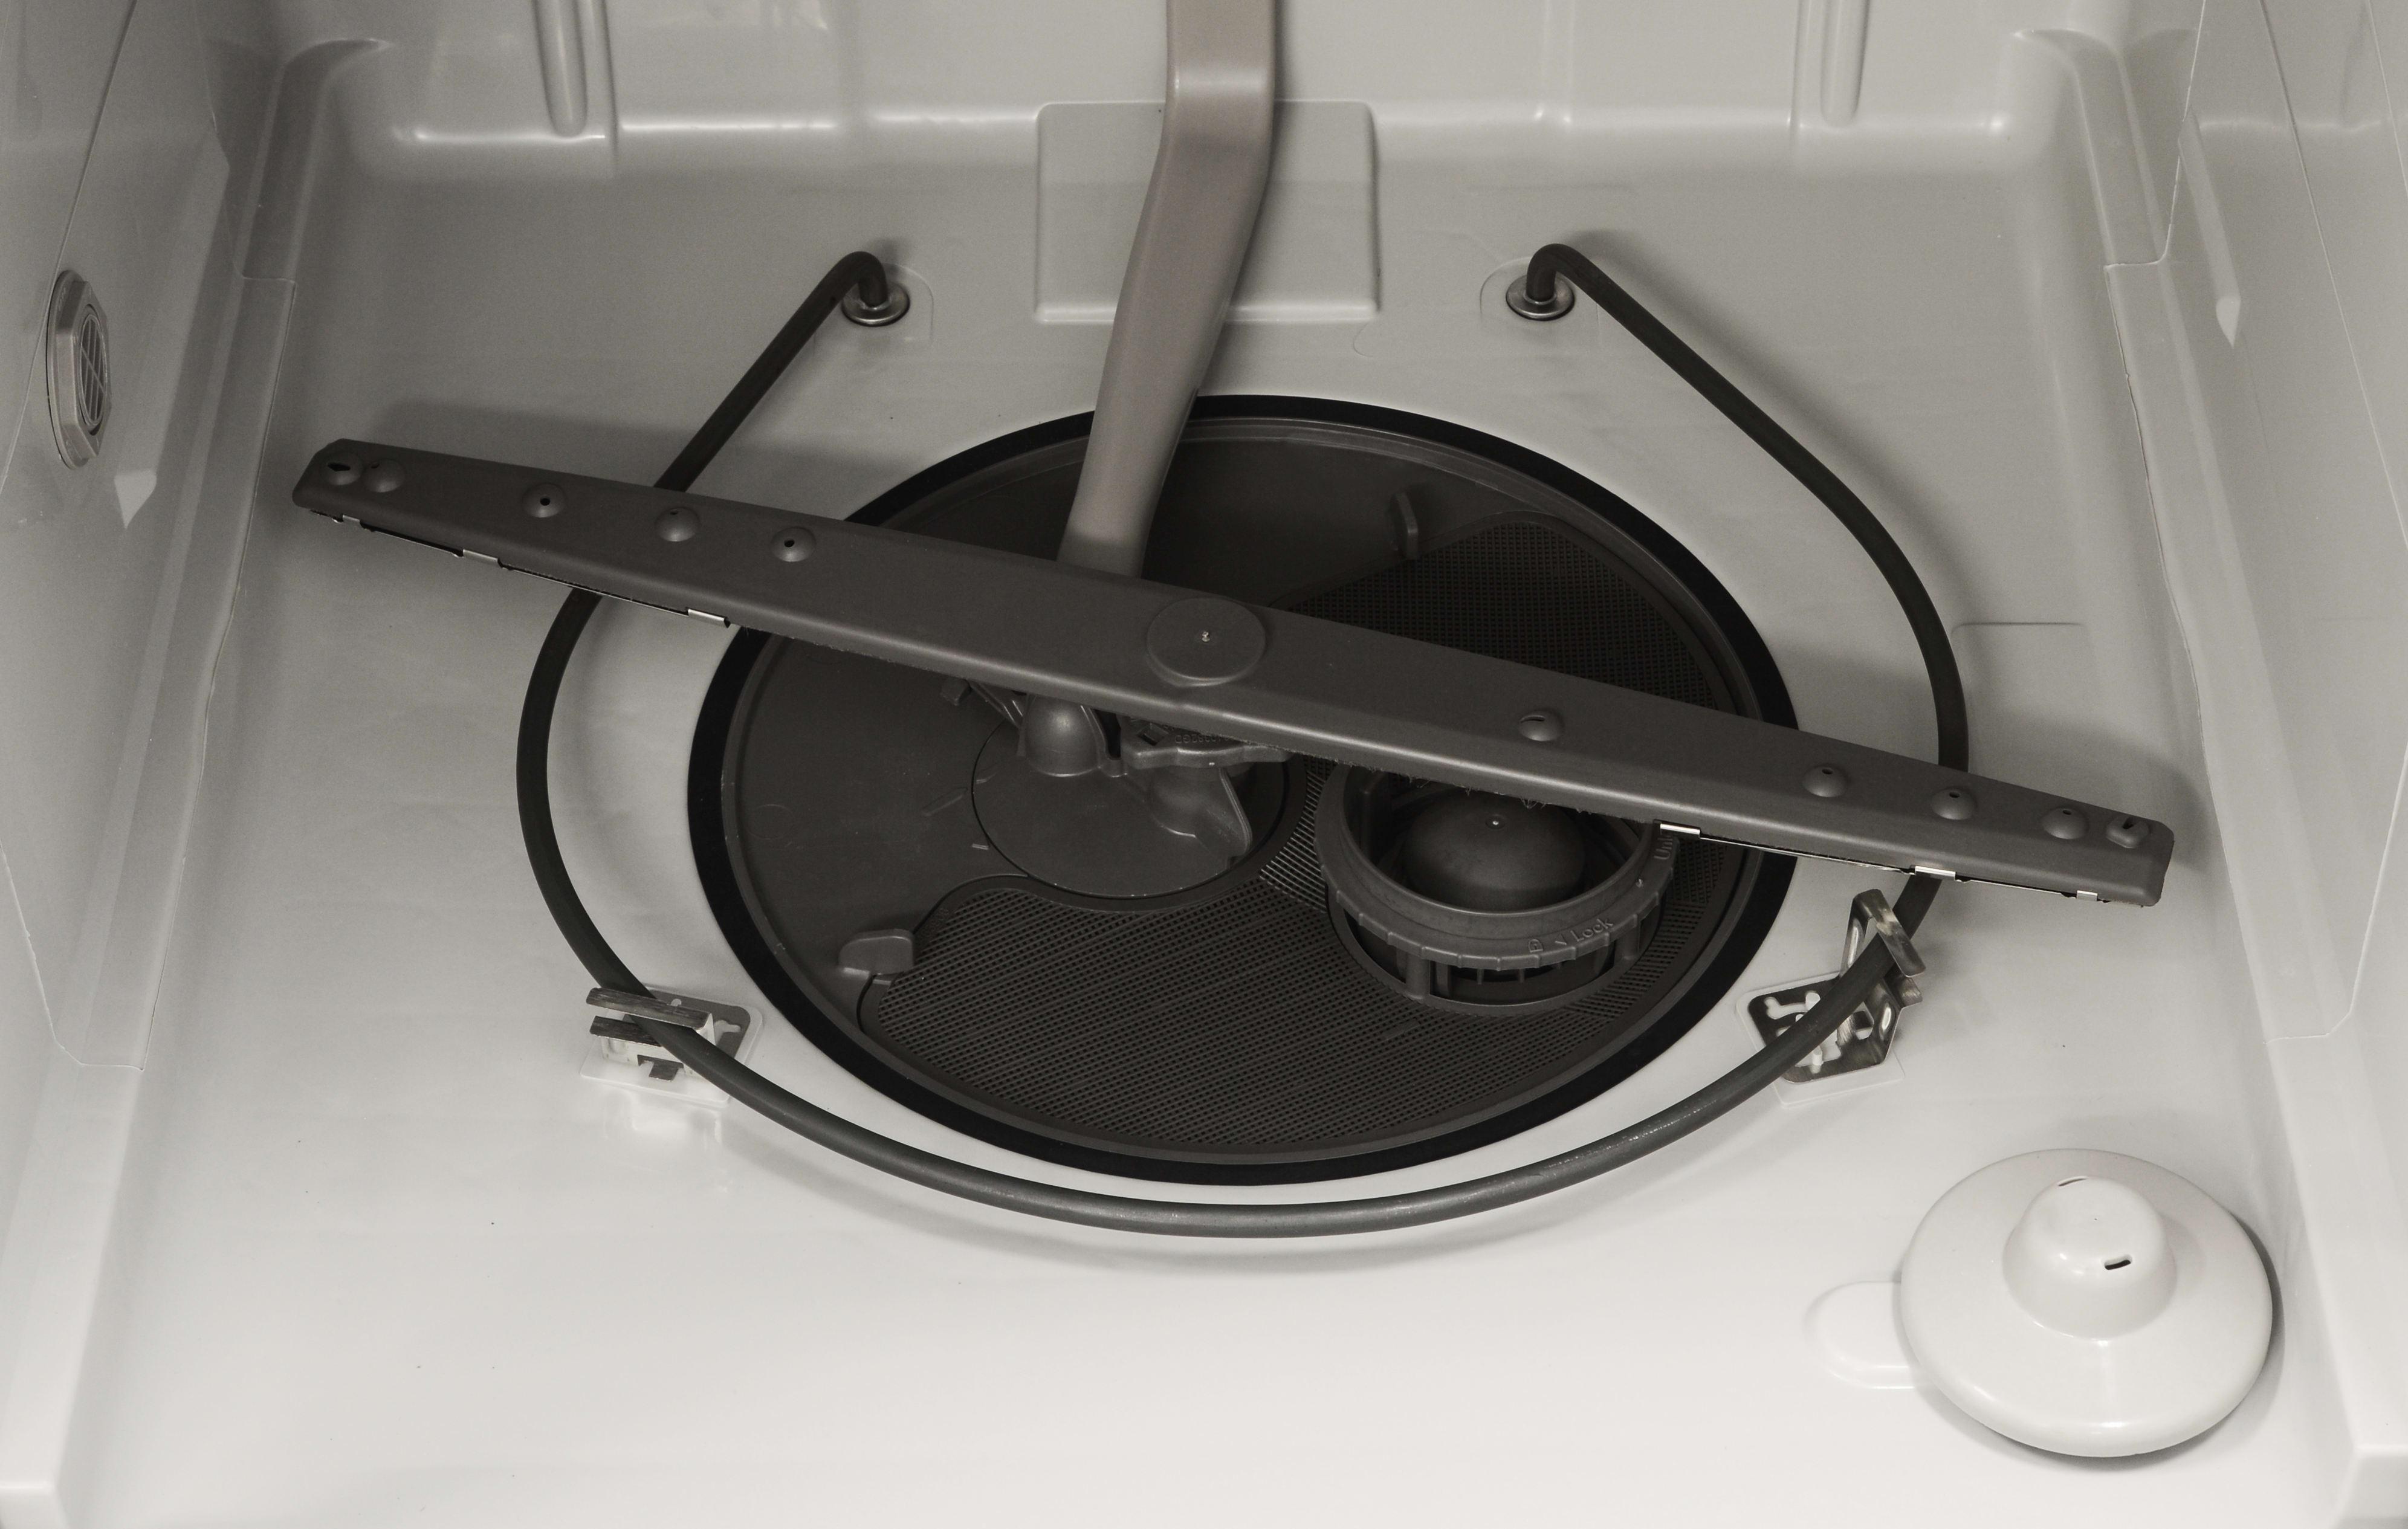 Whirlpool WDF540PADM filter